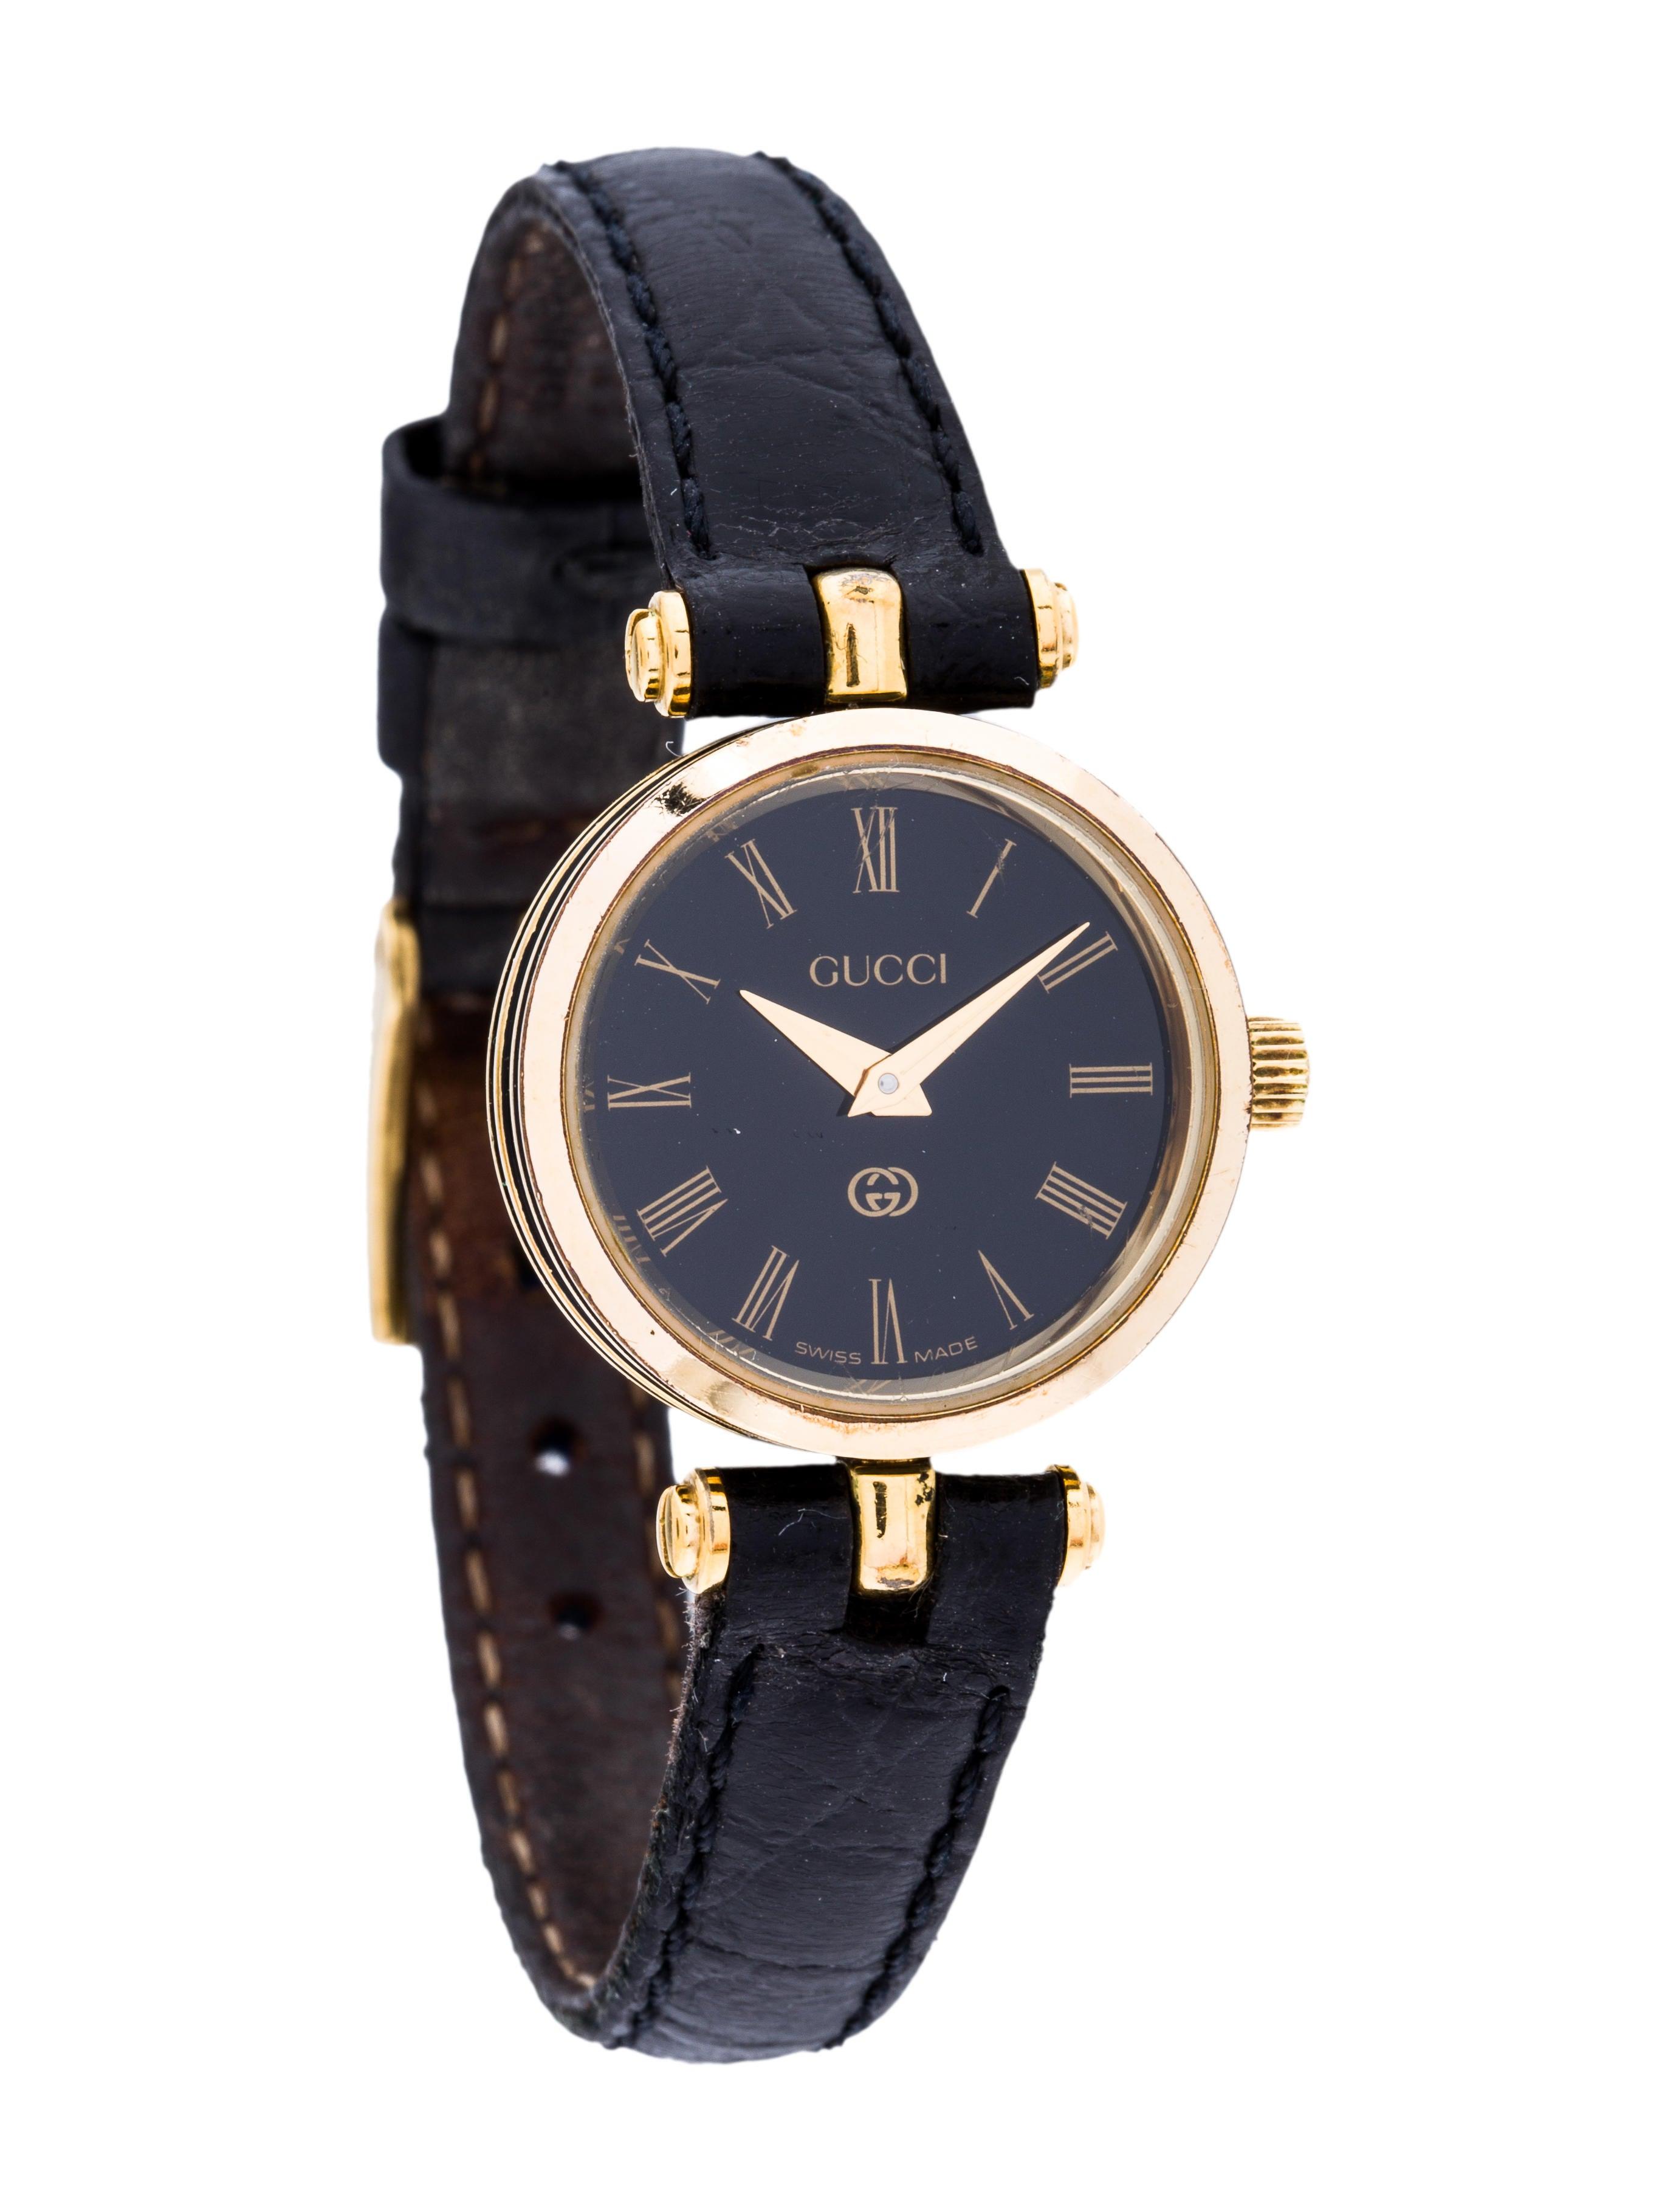 a3622f53e9b Gucci 2000 Series Watch - Strap - GUC205362